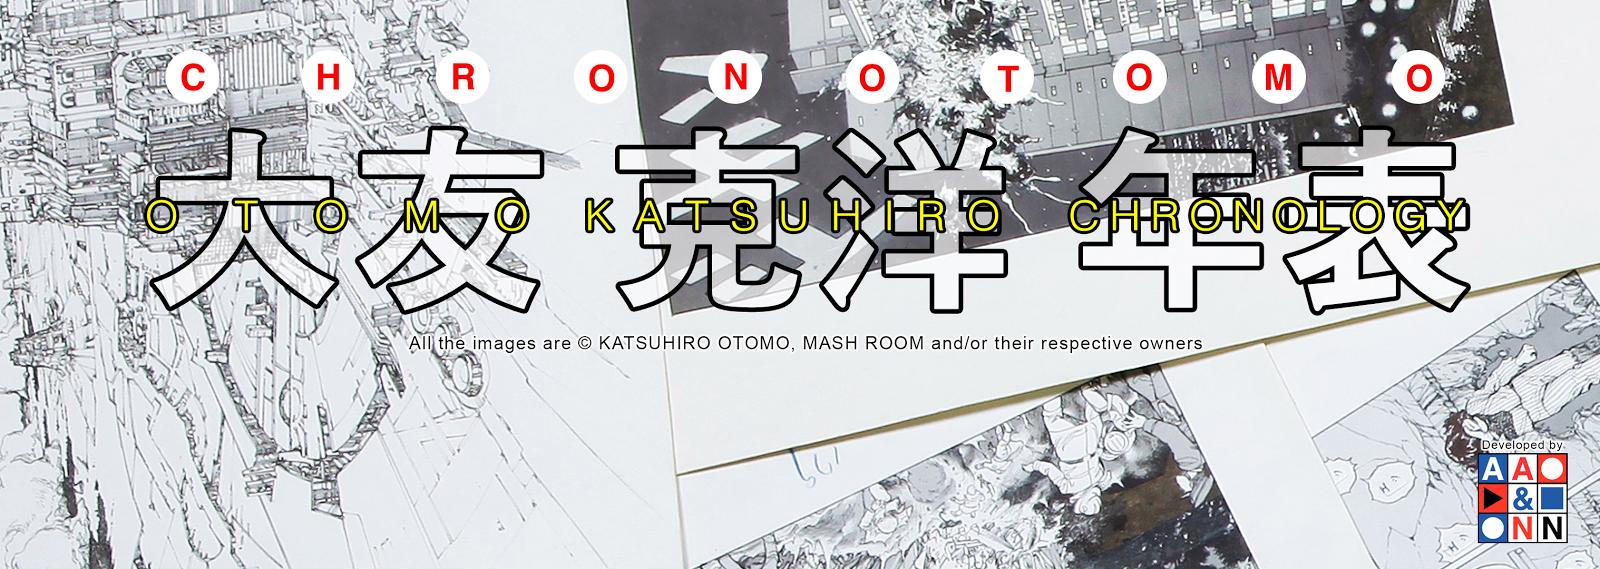 ChronOtomo | Otomo Katsuhiro Chronology